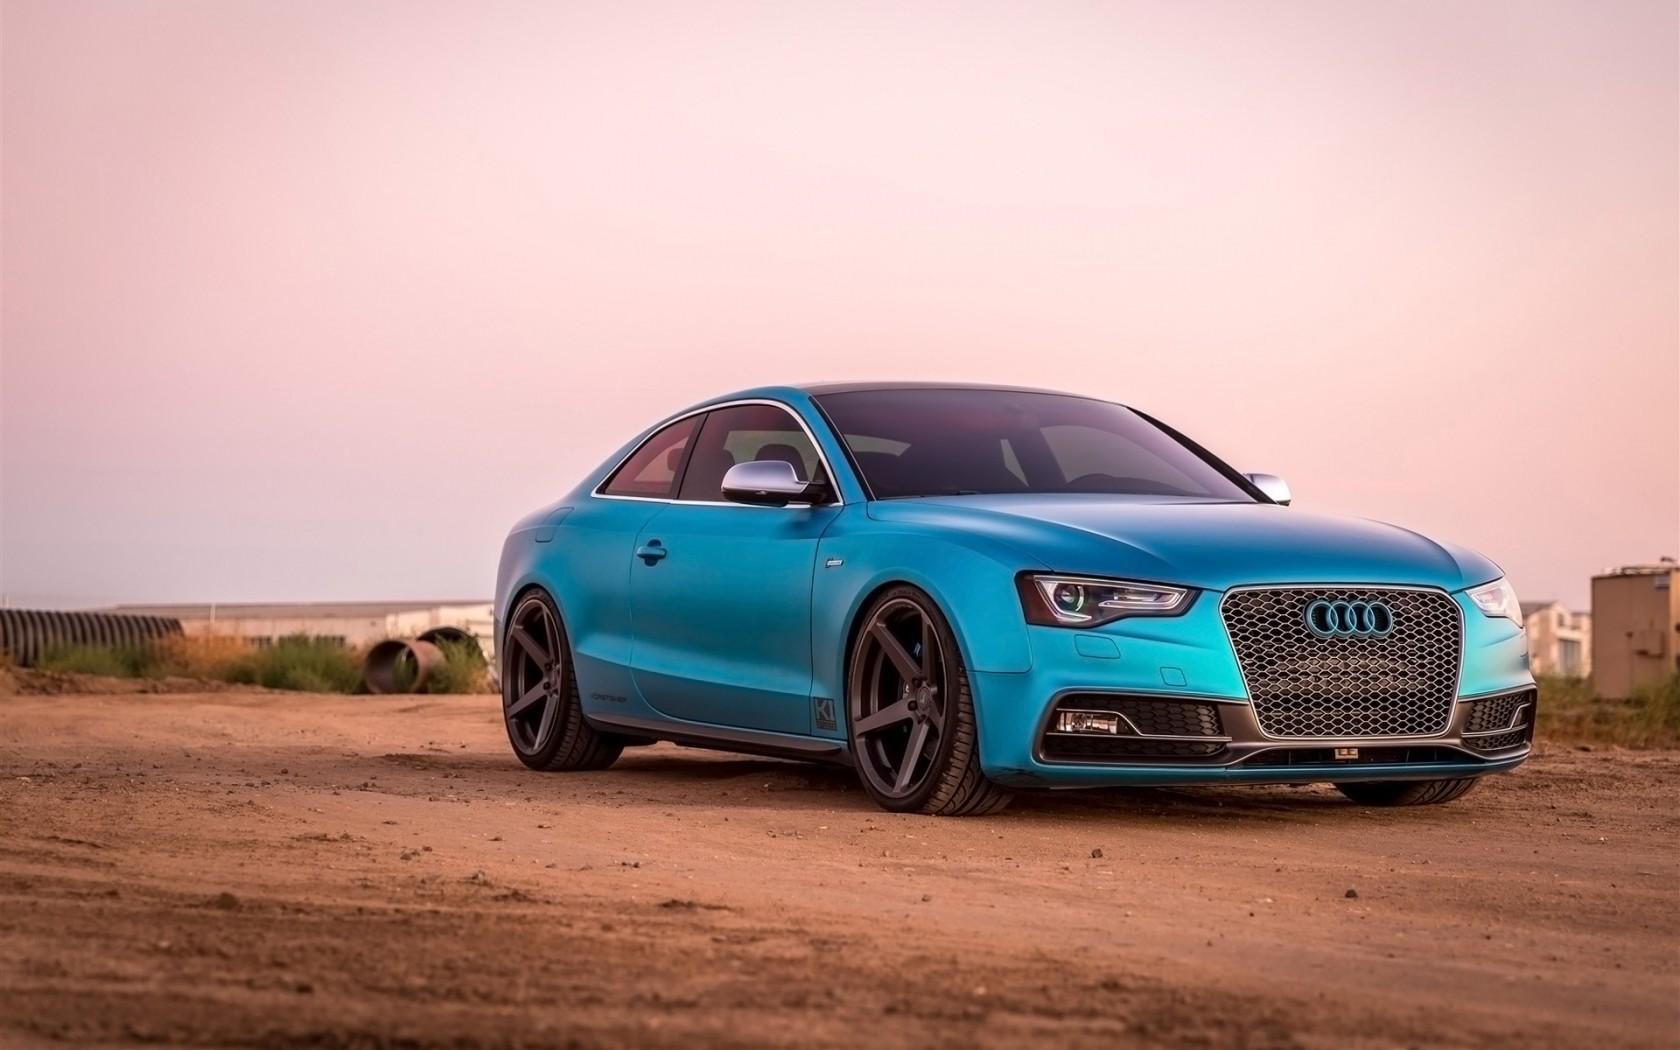 2016 Vorsteiner Audi S5 V FF 104 Carbon Graphite Wallpaper | HD Car Wallpapers | ID #6808